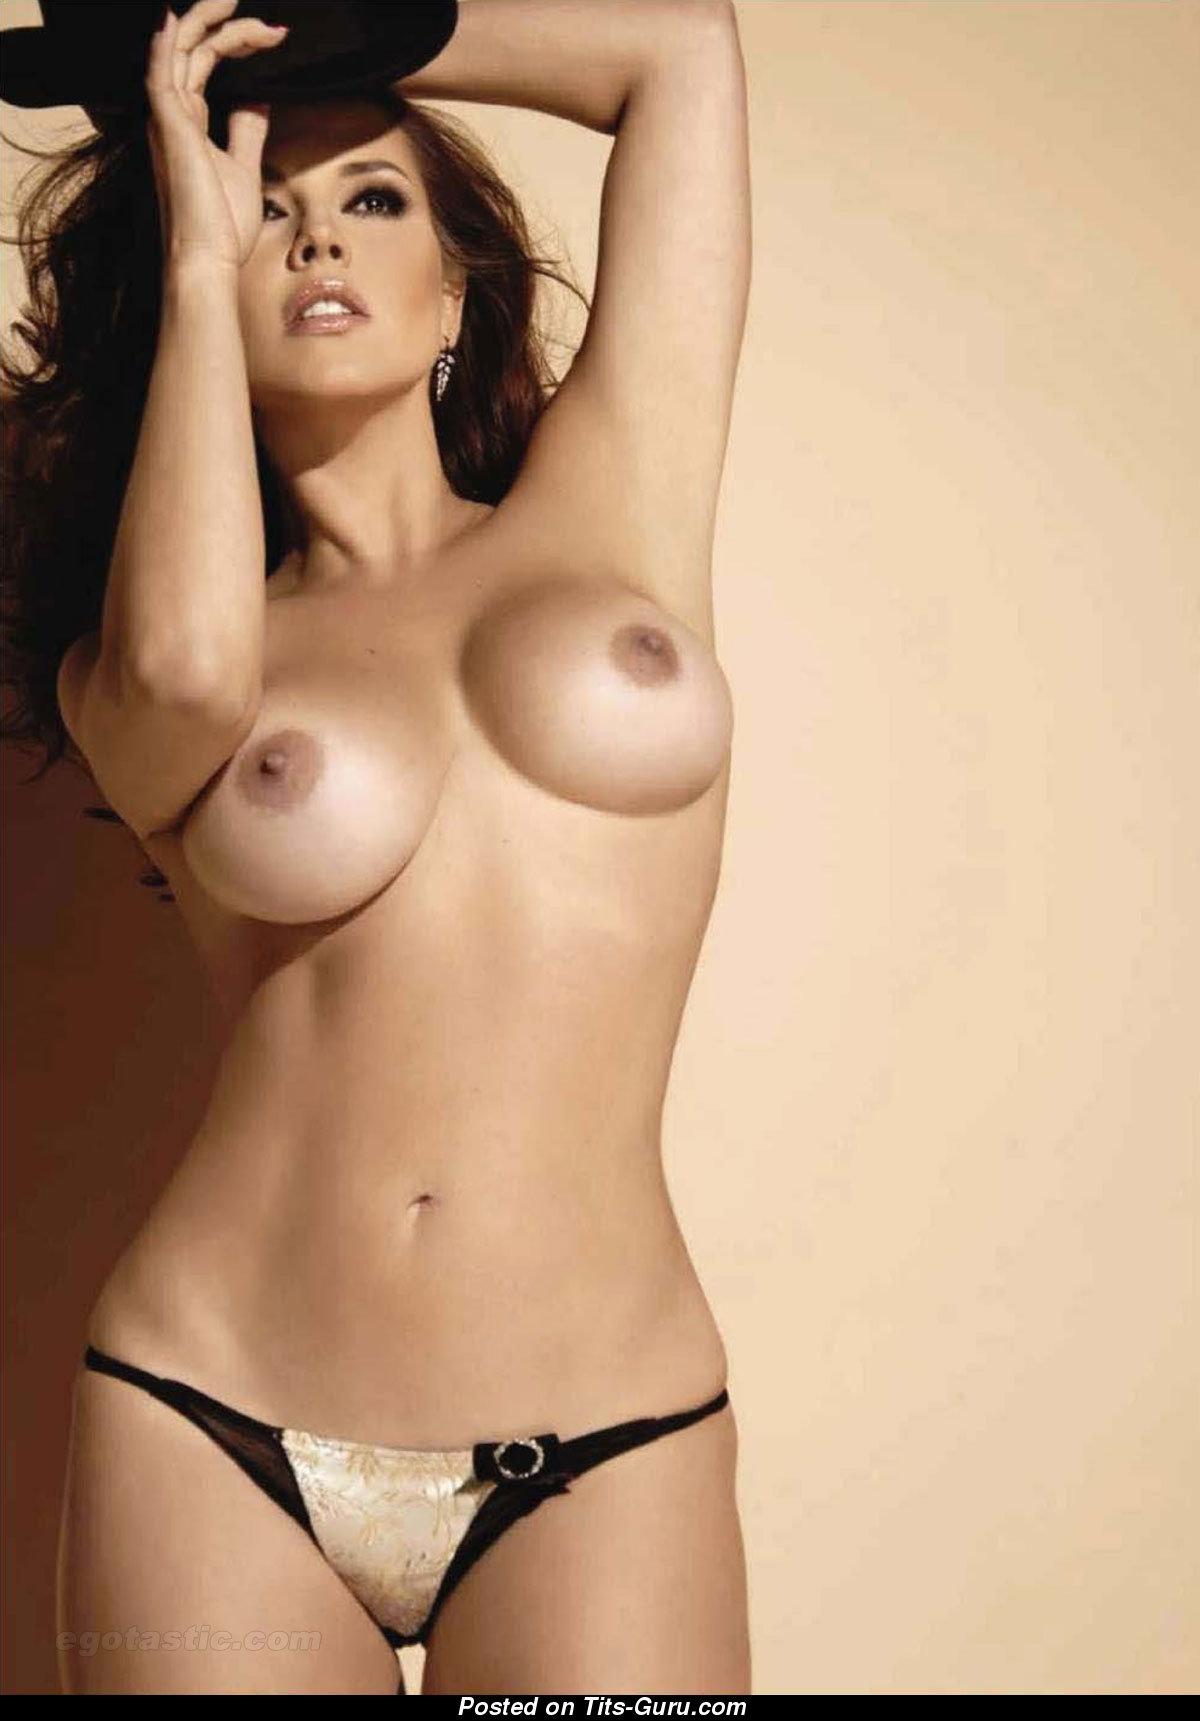 Alicia Machado - Latina Red Hair Actress With Bare -8761